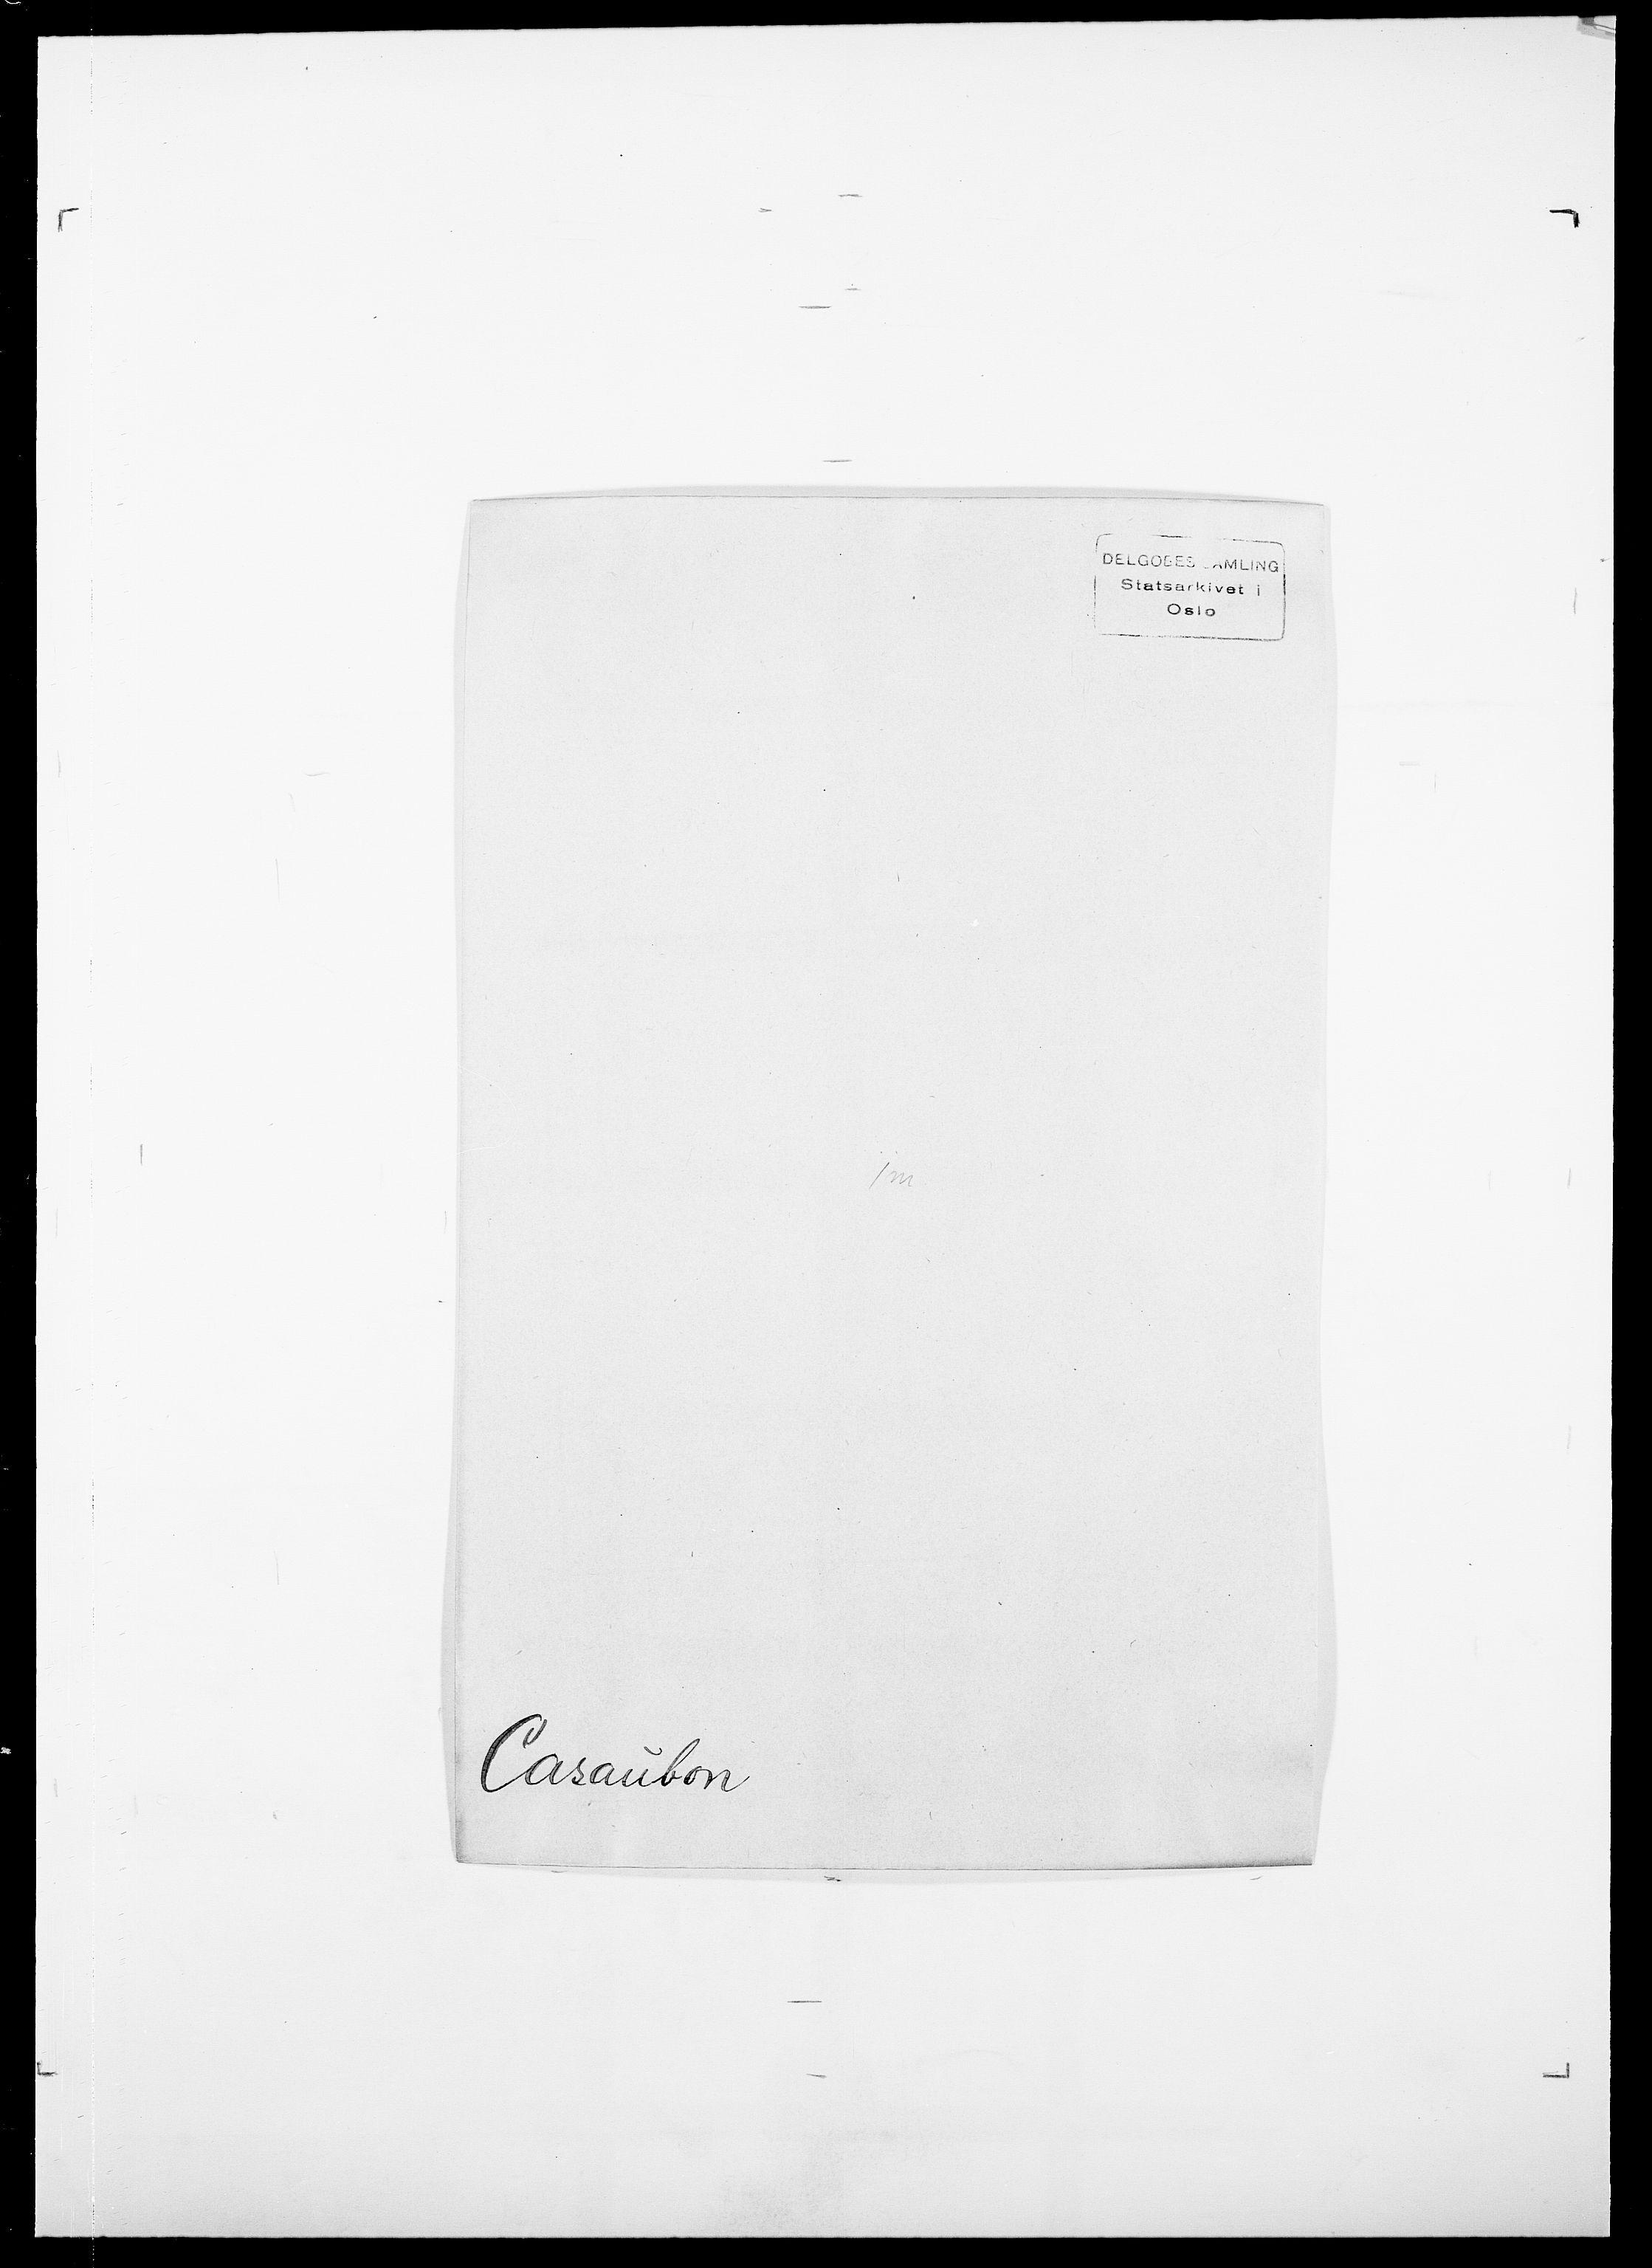 SAO, Delgobe, Charles Antoine - samling, D/Da/L0008: Capjon - Dagenbolt, s. 109